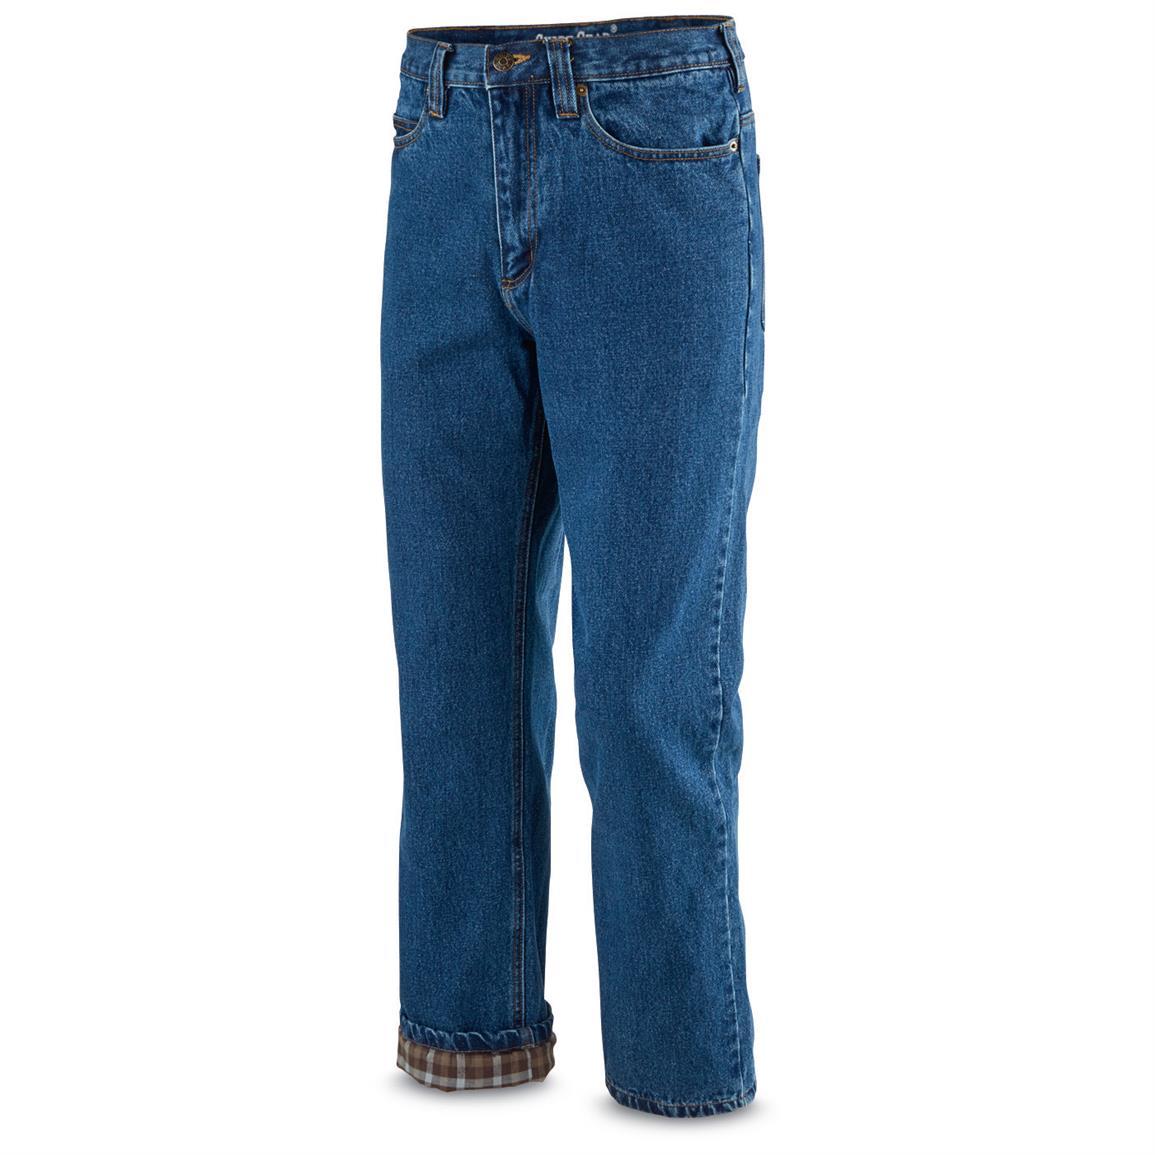 flannel lined jeans guide gear menu0027s flannel-lined denim jeans, stonewash hftnusp